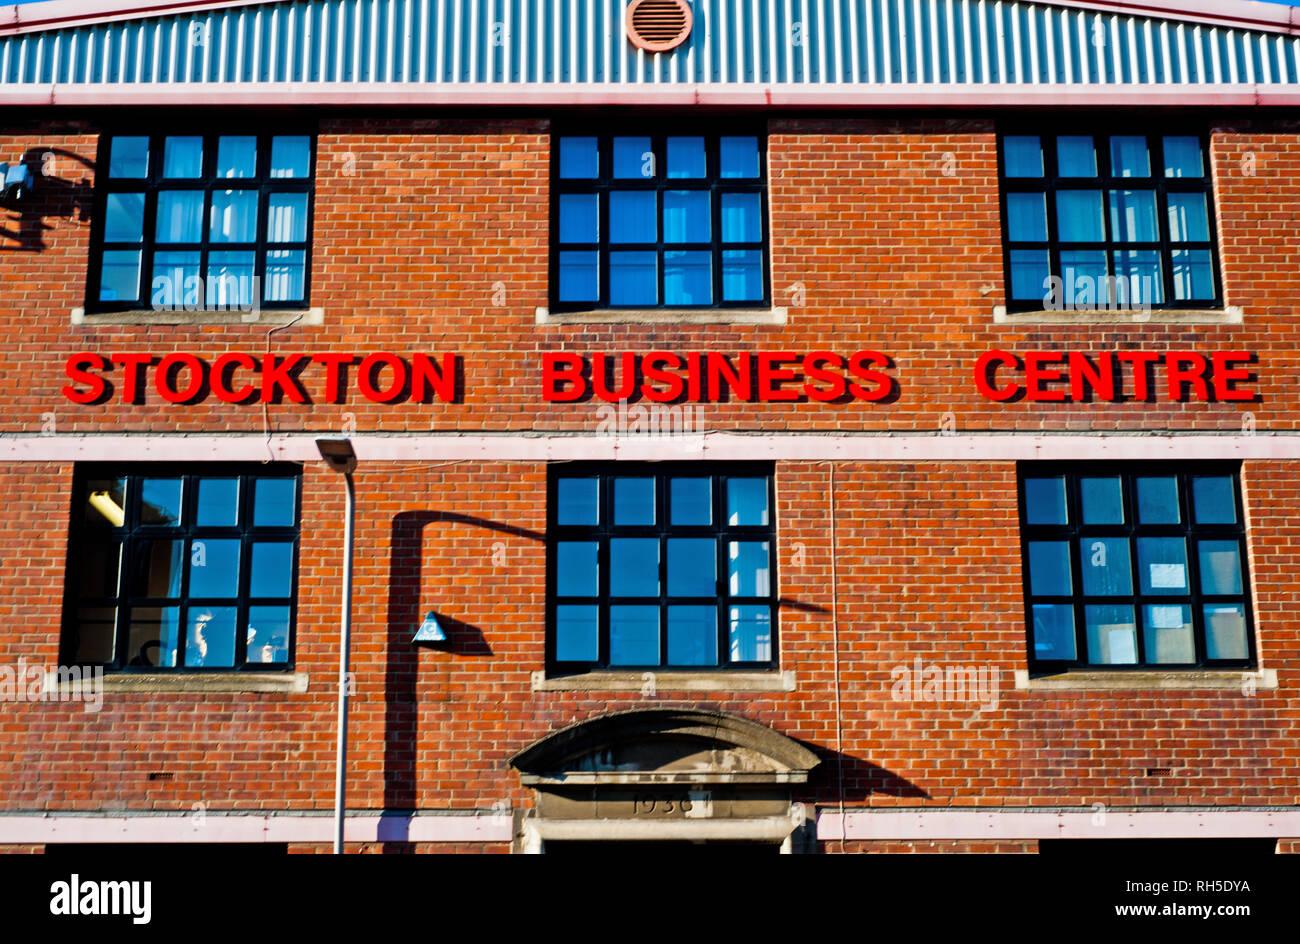 Stockton Buisness Centre, Brunswick Street, Stockton on Tees, Cleveland, England - Stock Image